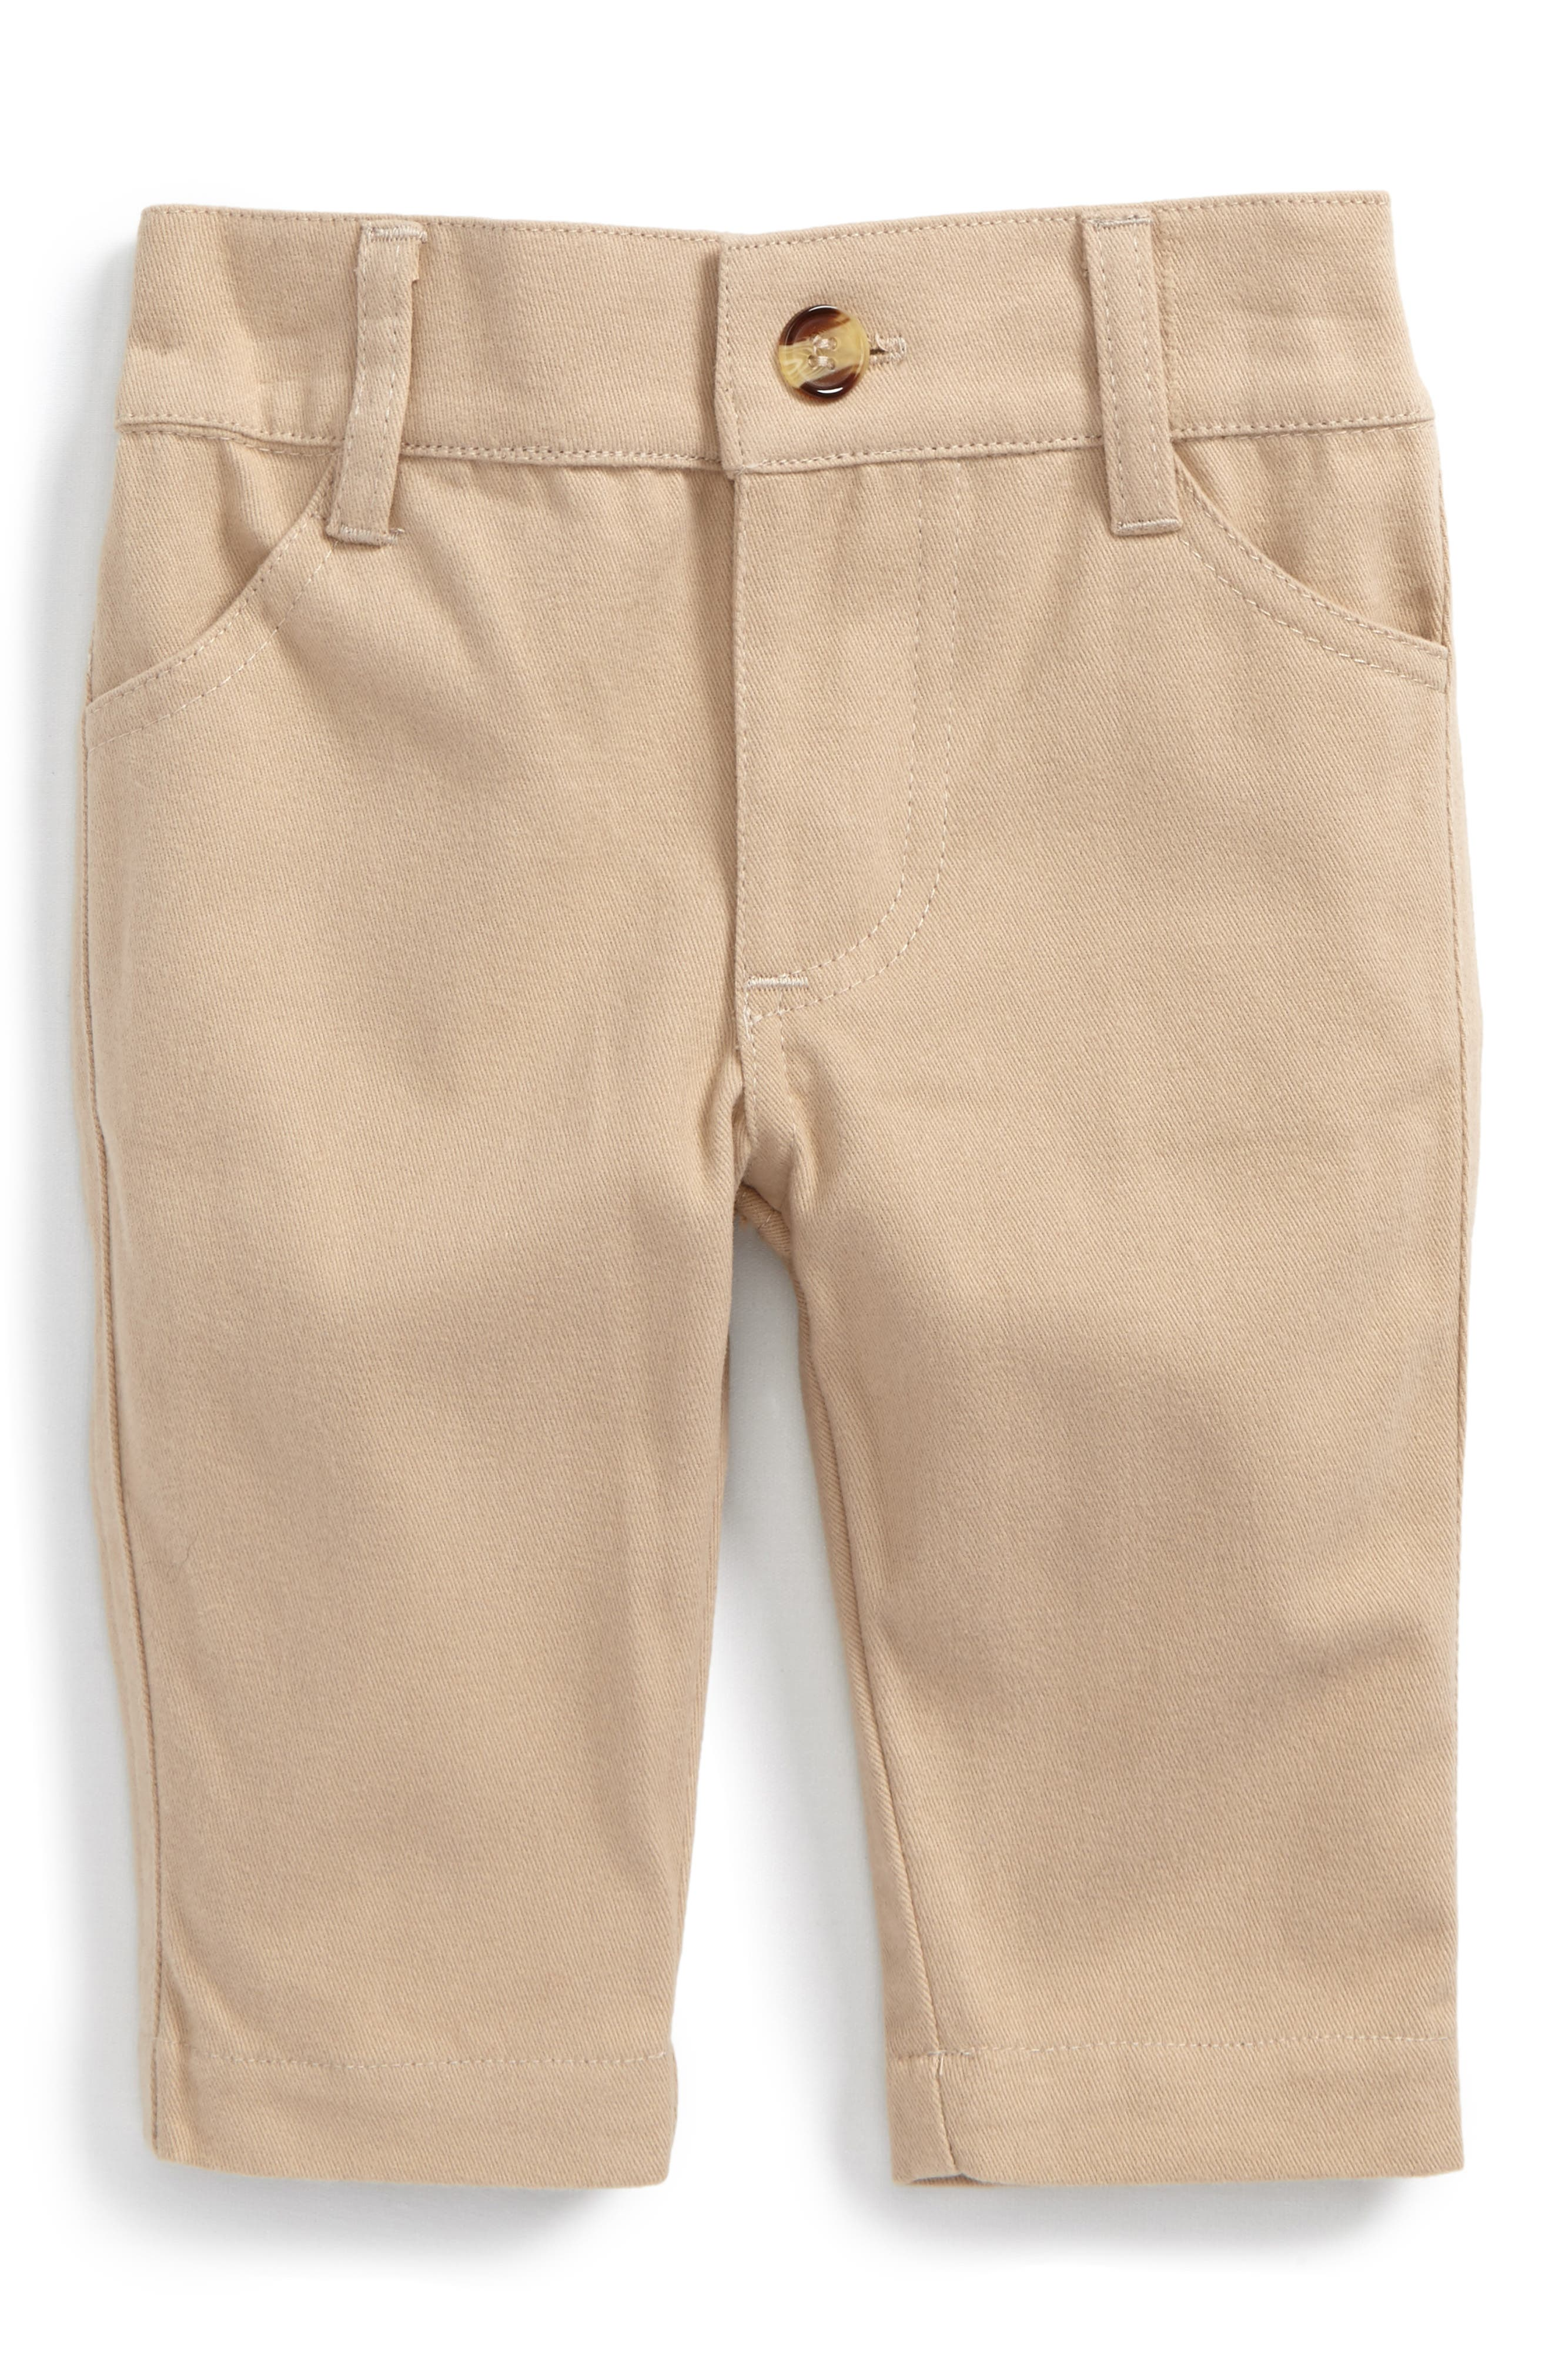 Stretch Cotton Twill Pants,                             Main thumbnail 1, color,                             Beige/ Khaki